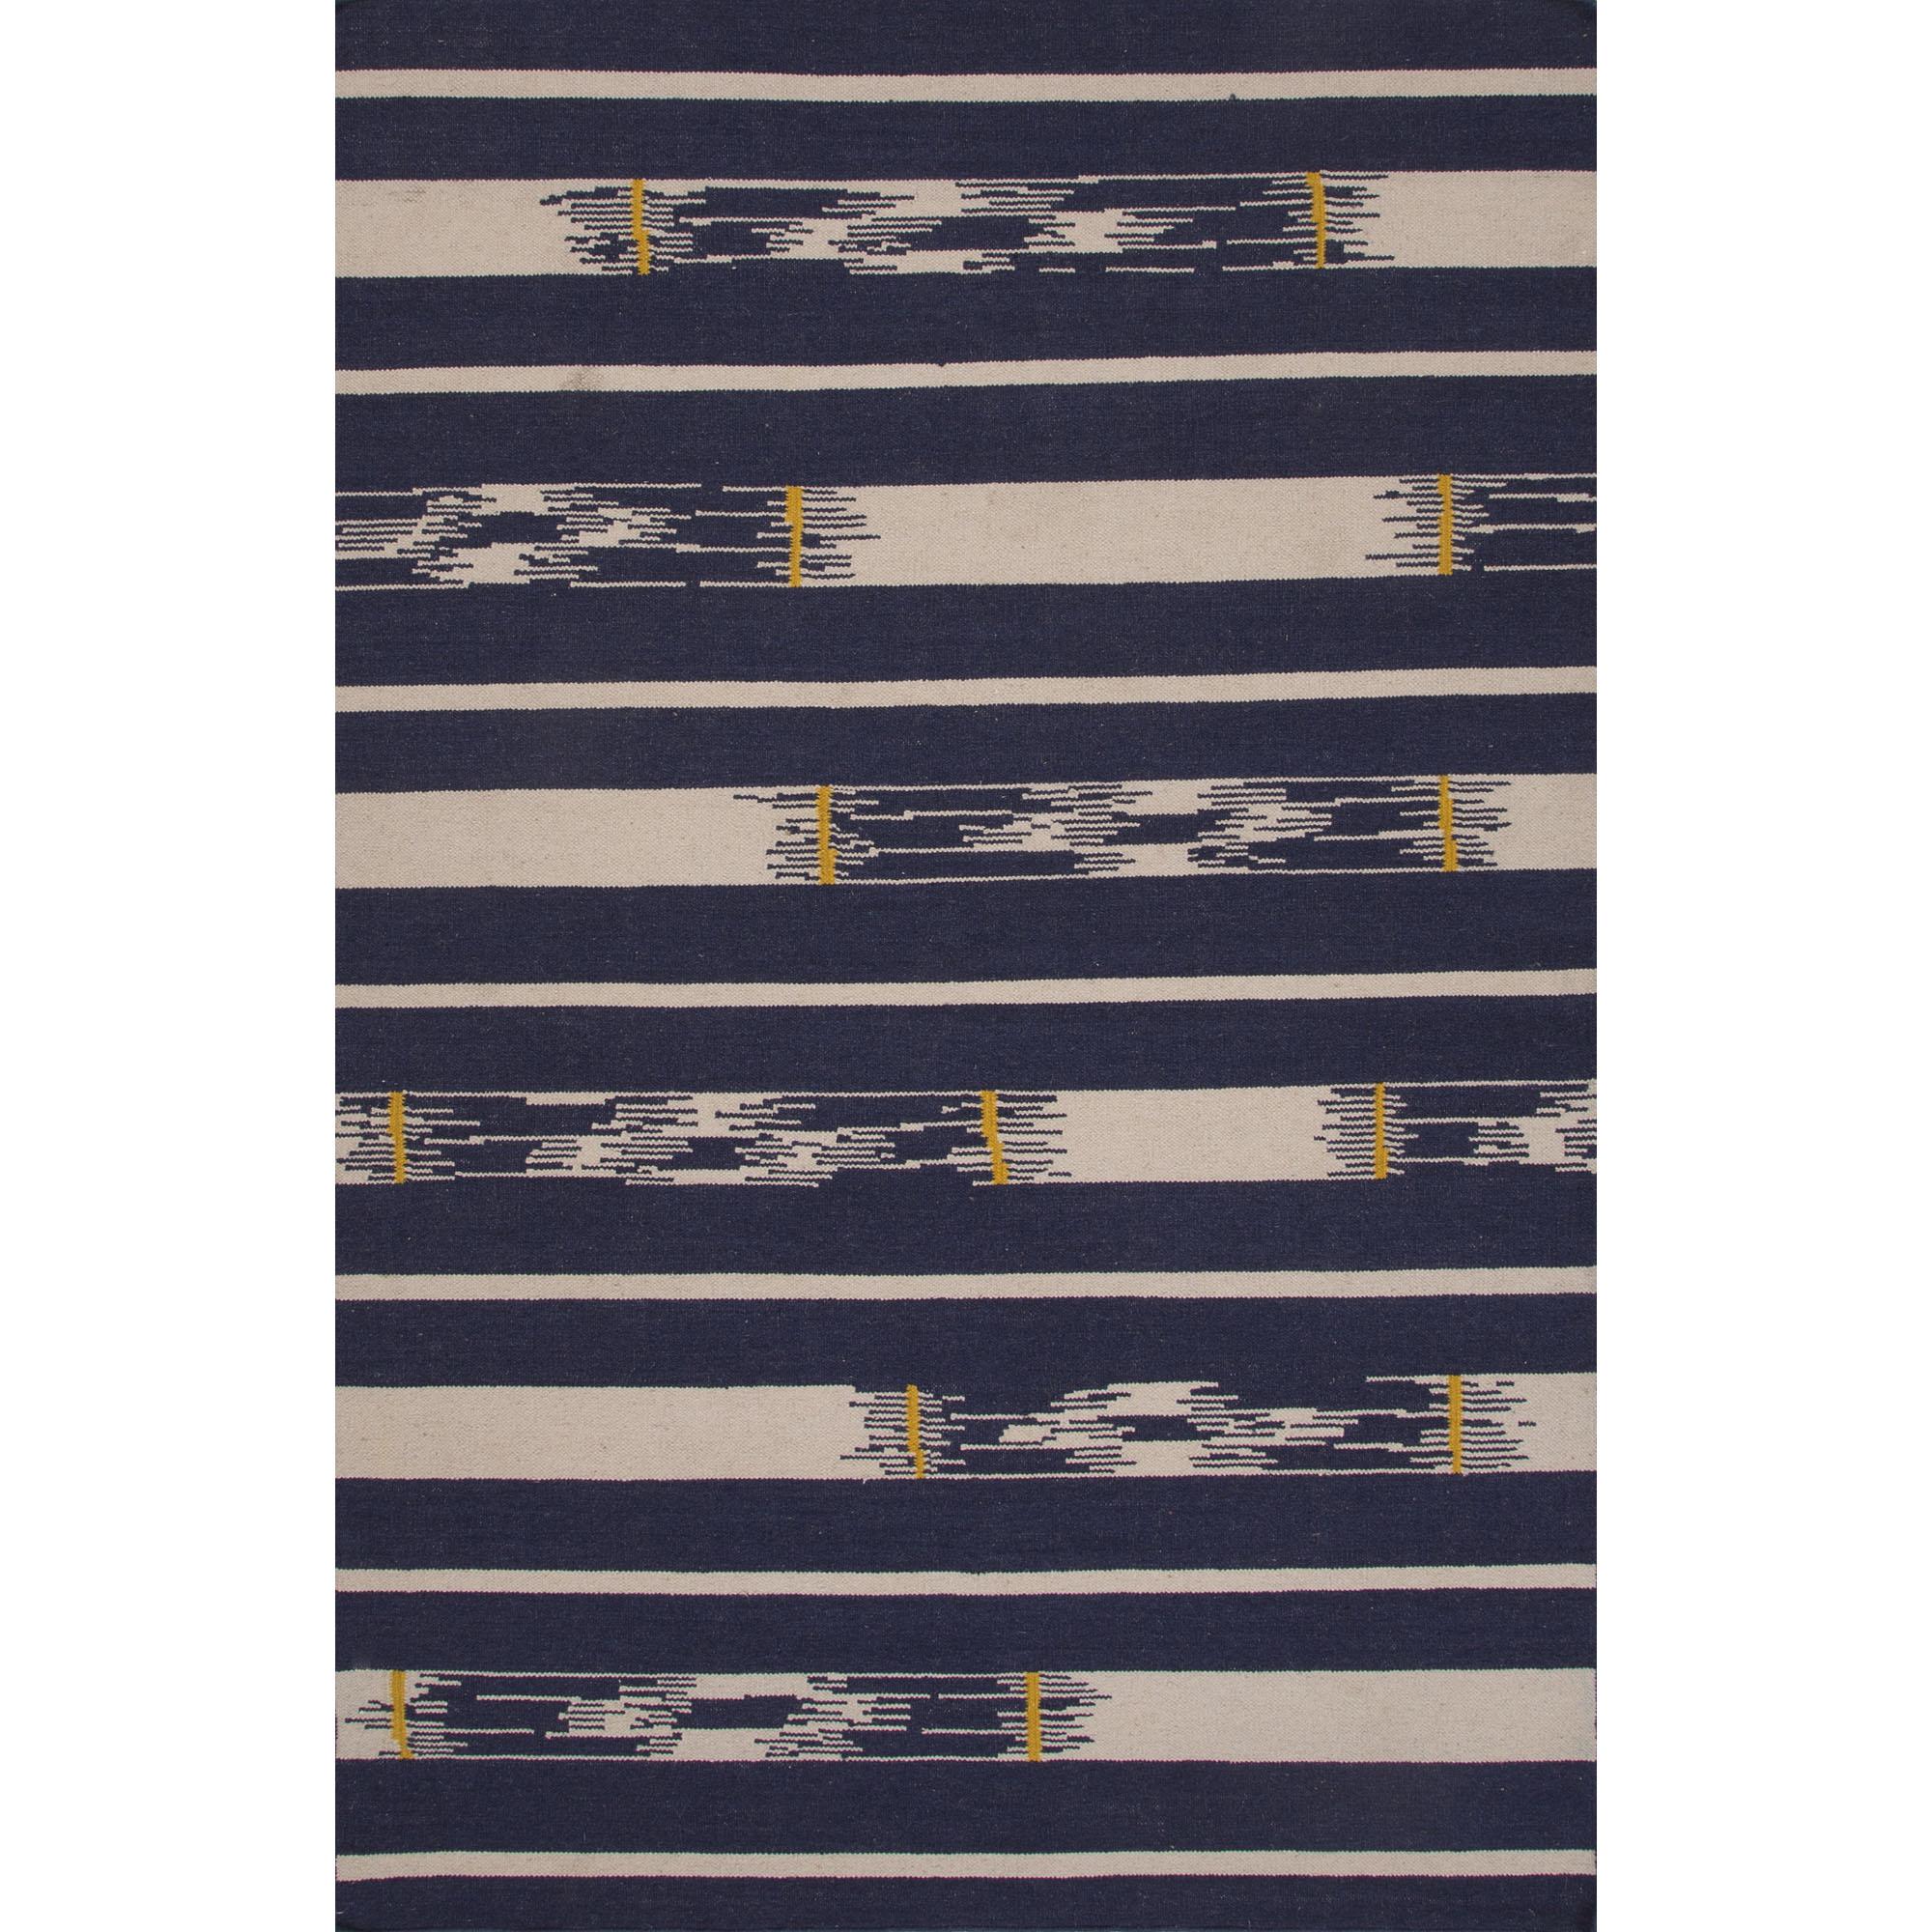 JAIPUR Rugs Traditions Modern Flat Weave 2 x 3 Rug - Item Number: RUG122240